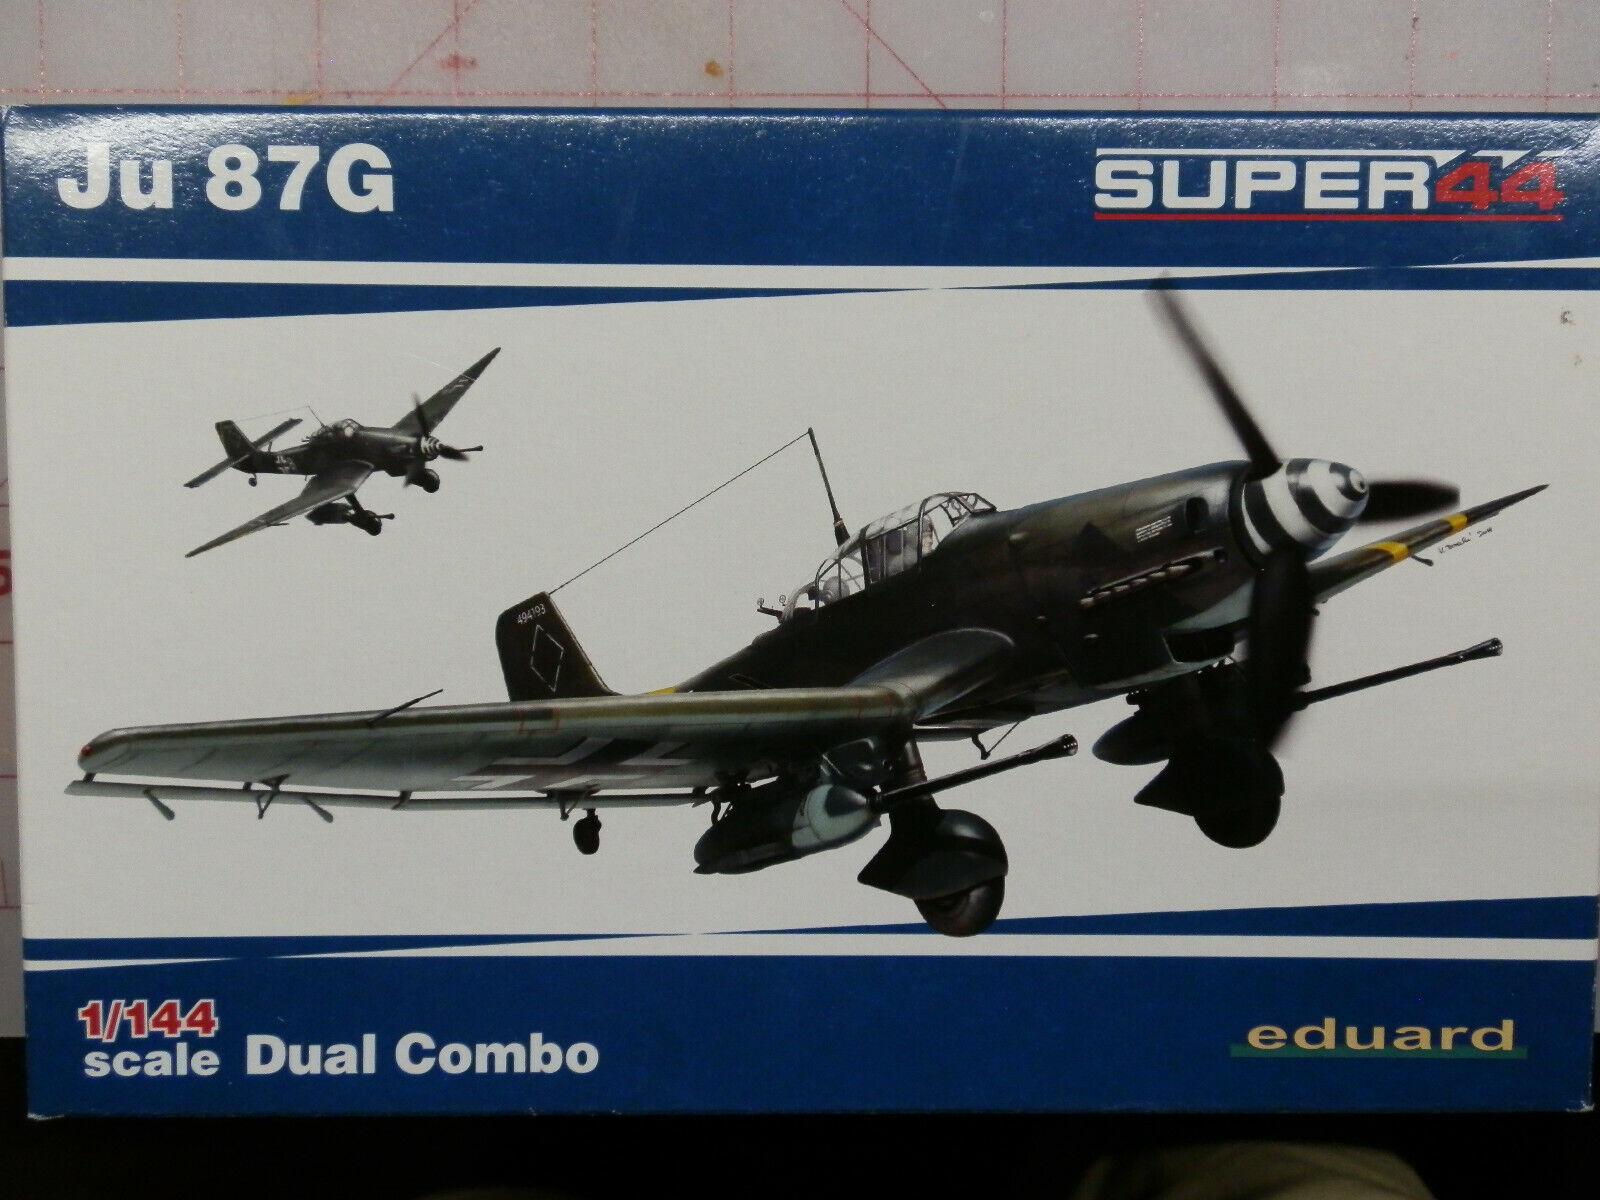 Eduard Edua4430 Ju 87G DUAL COMBO 1//144